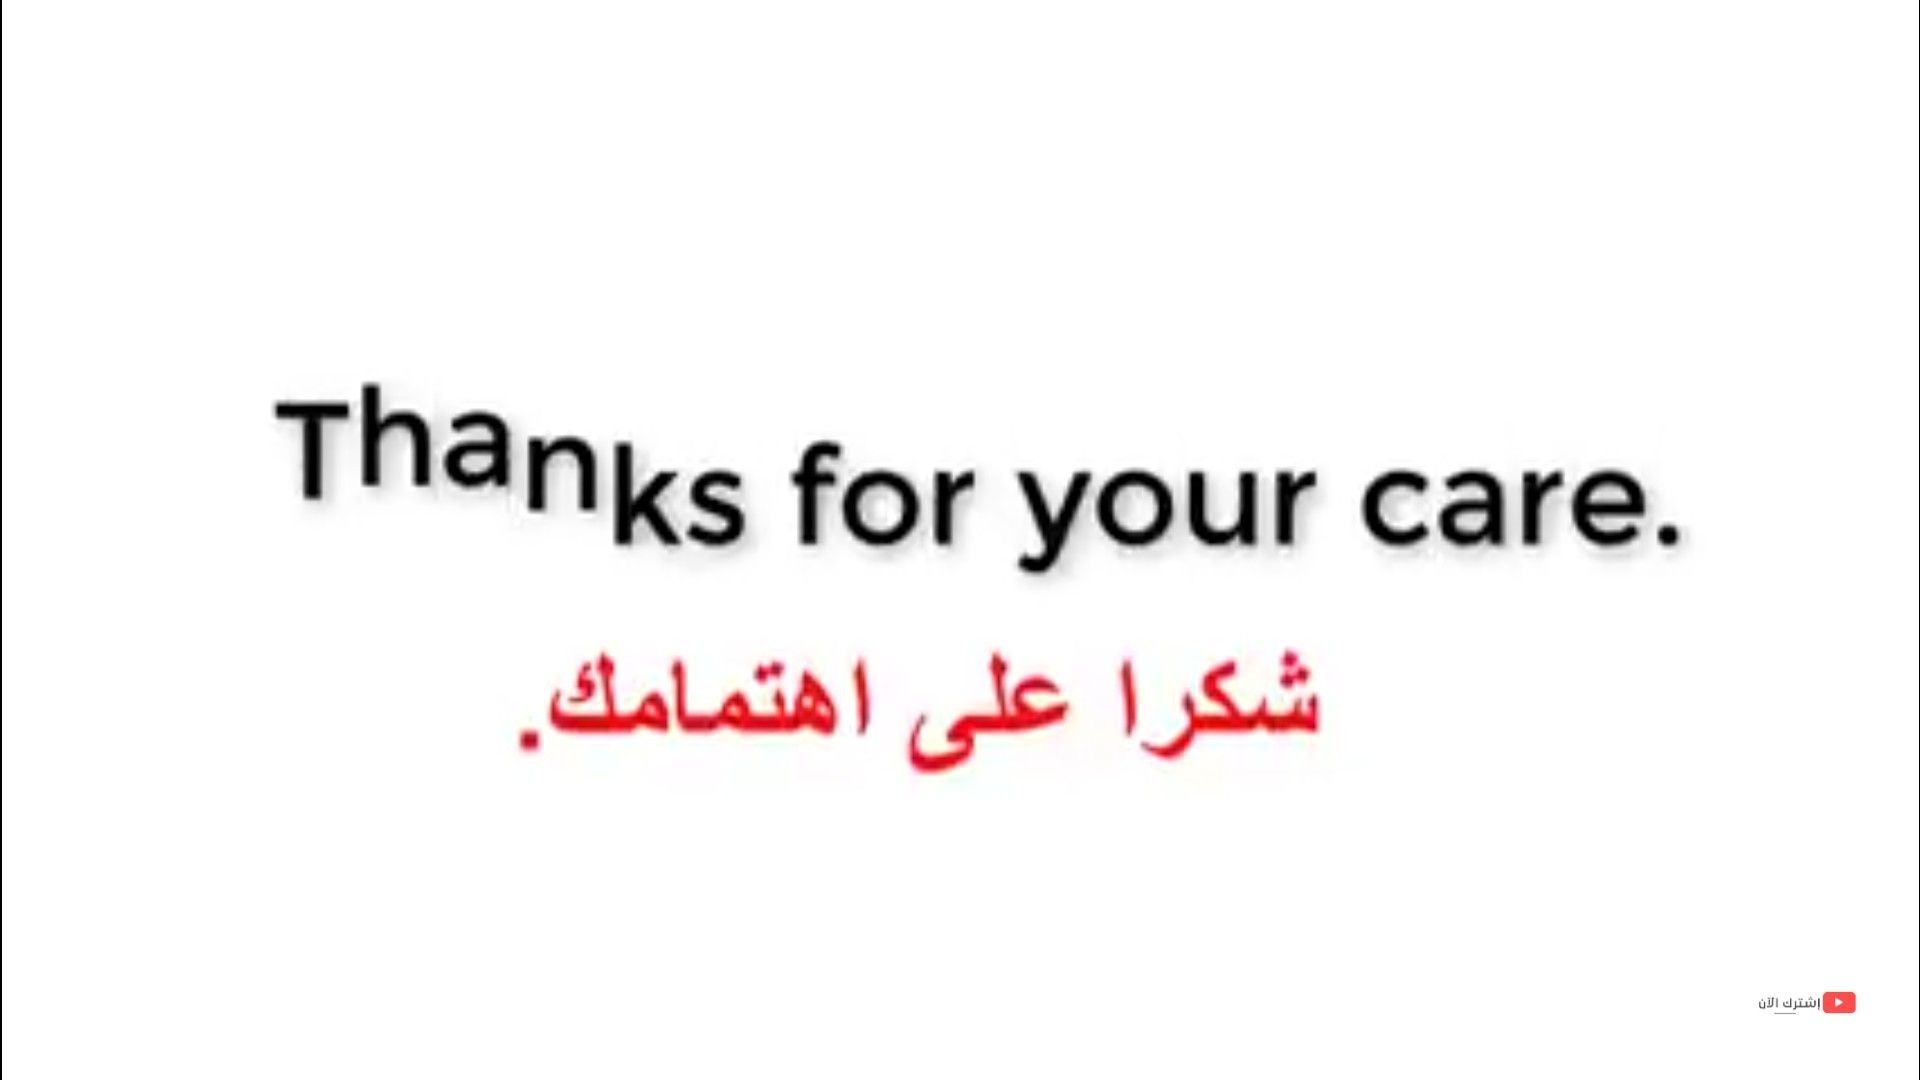 Learning Arabic Msa Fabienne Learn English English Language Course Learning Arabic